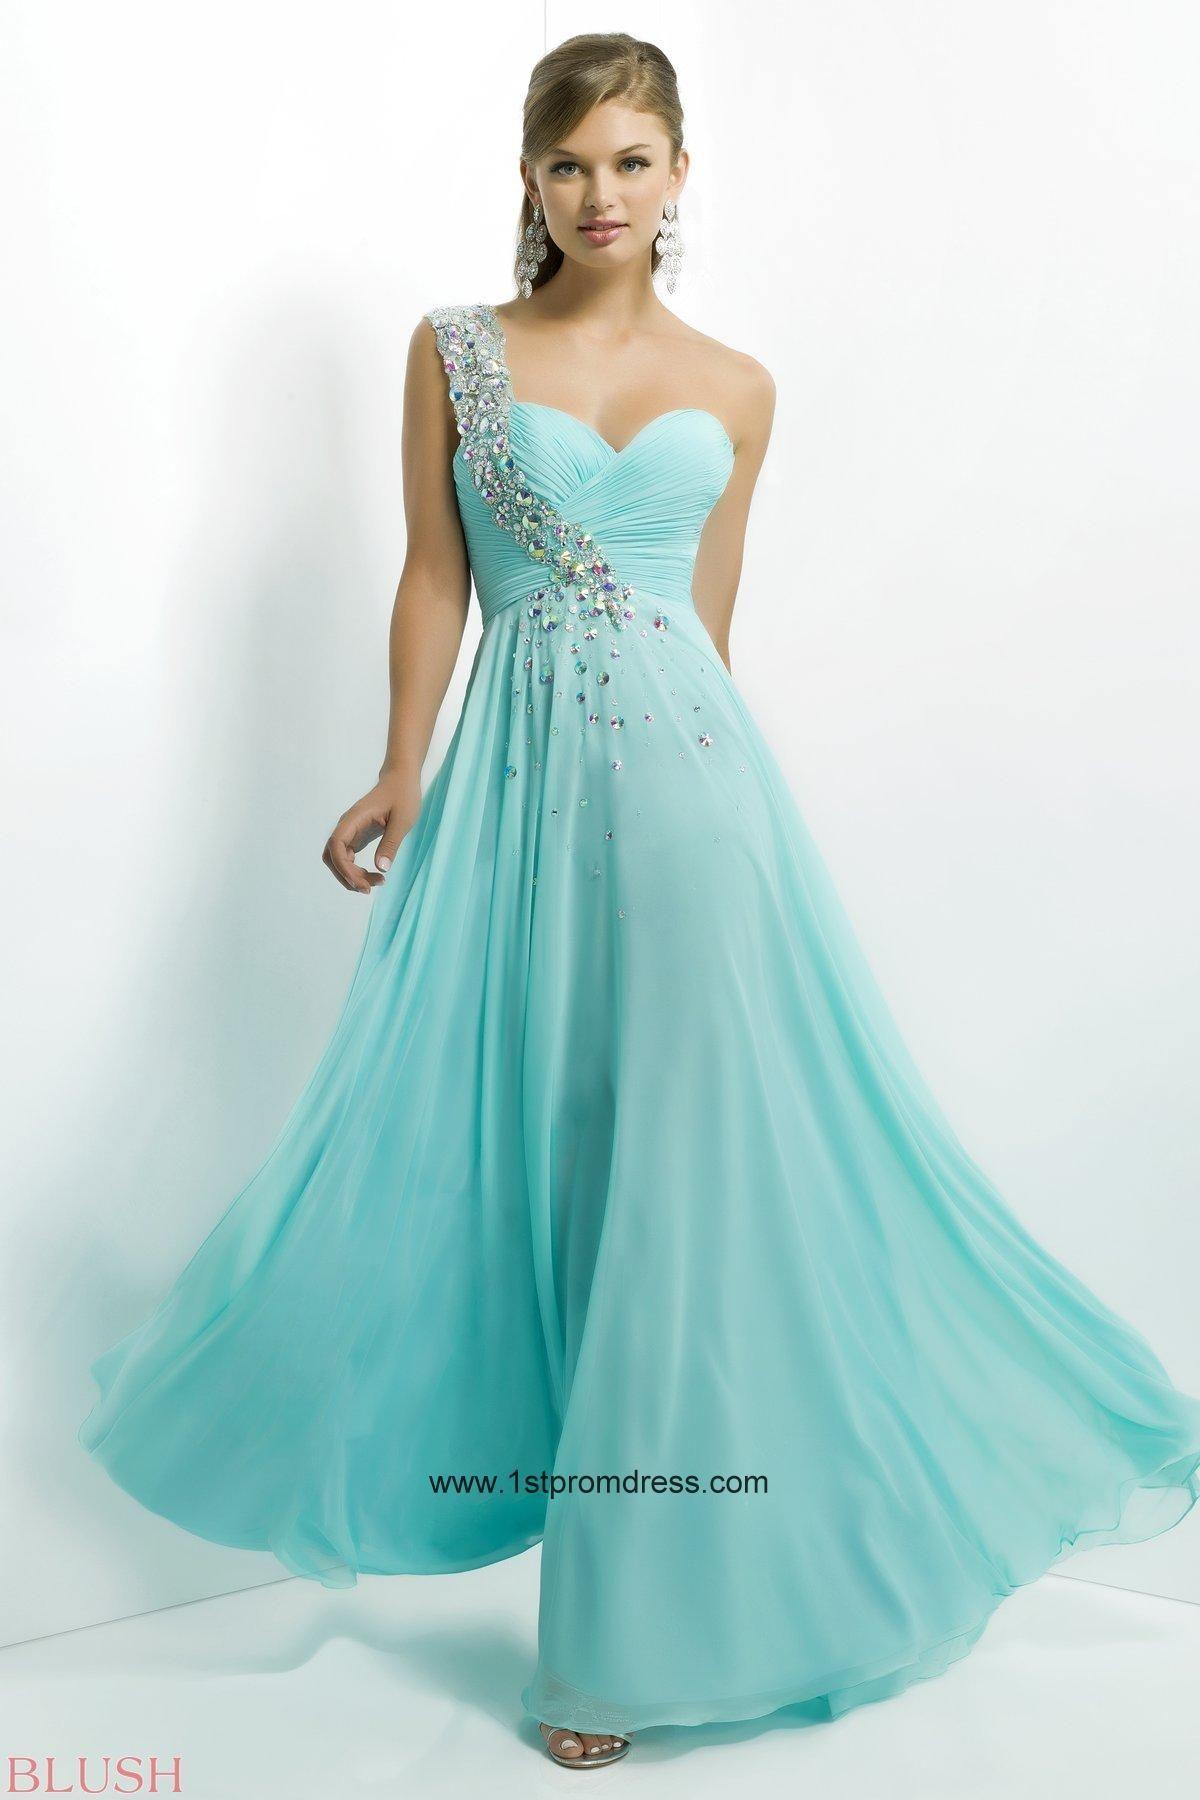 Images of Beautiful Prom Dresses - Reikian